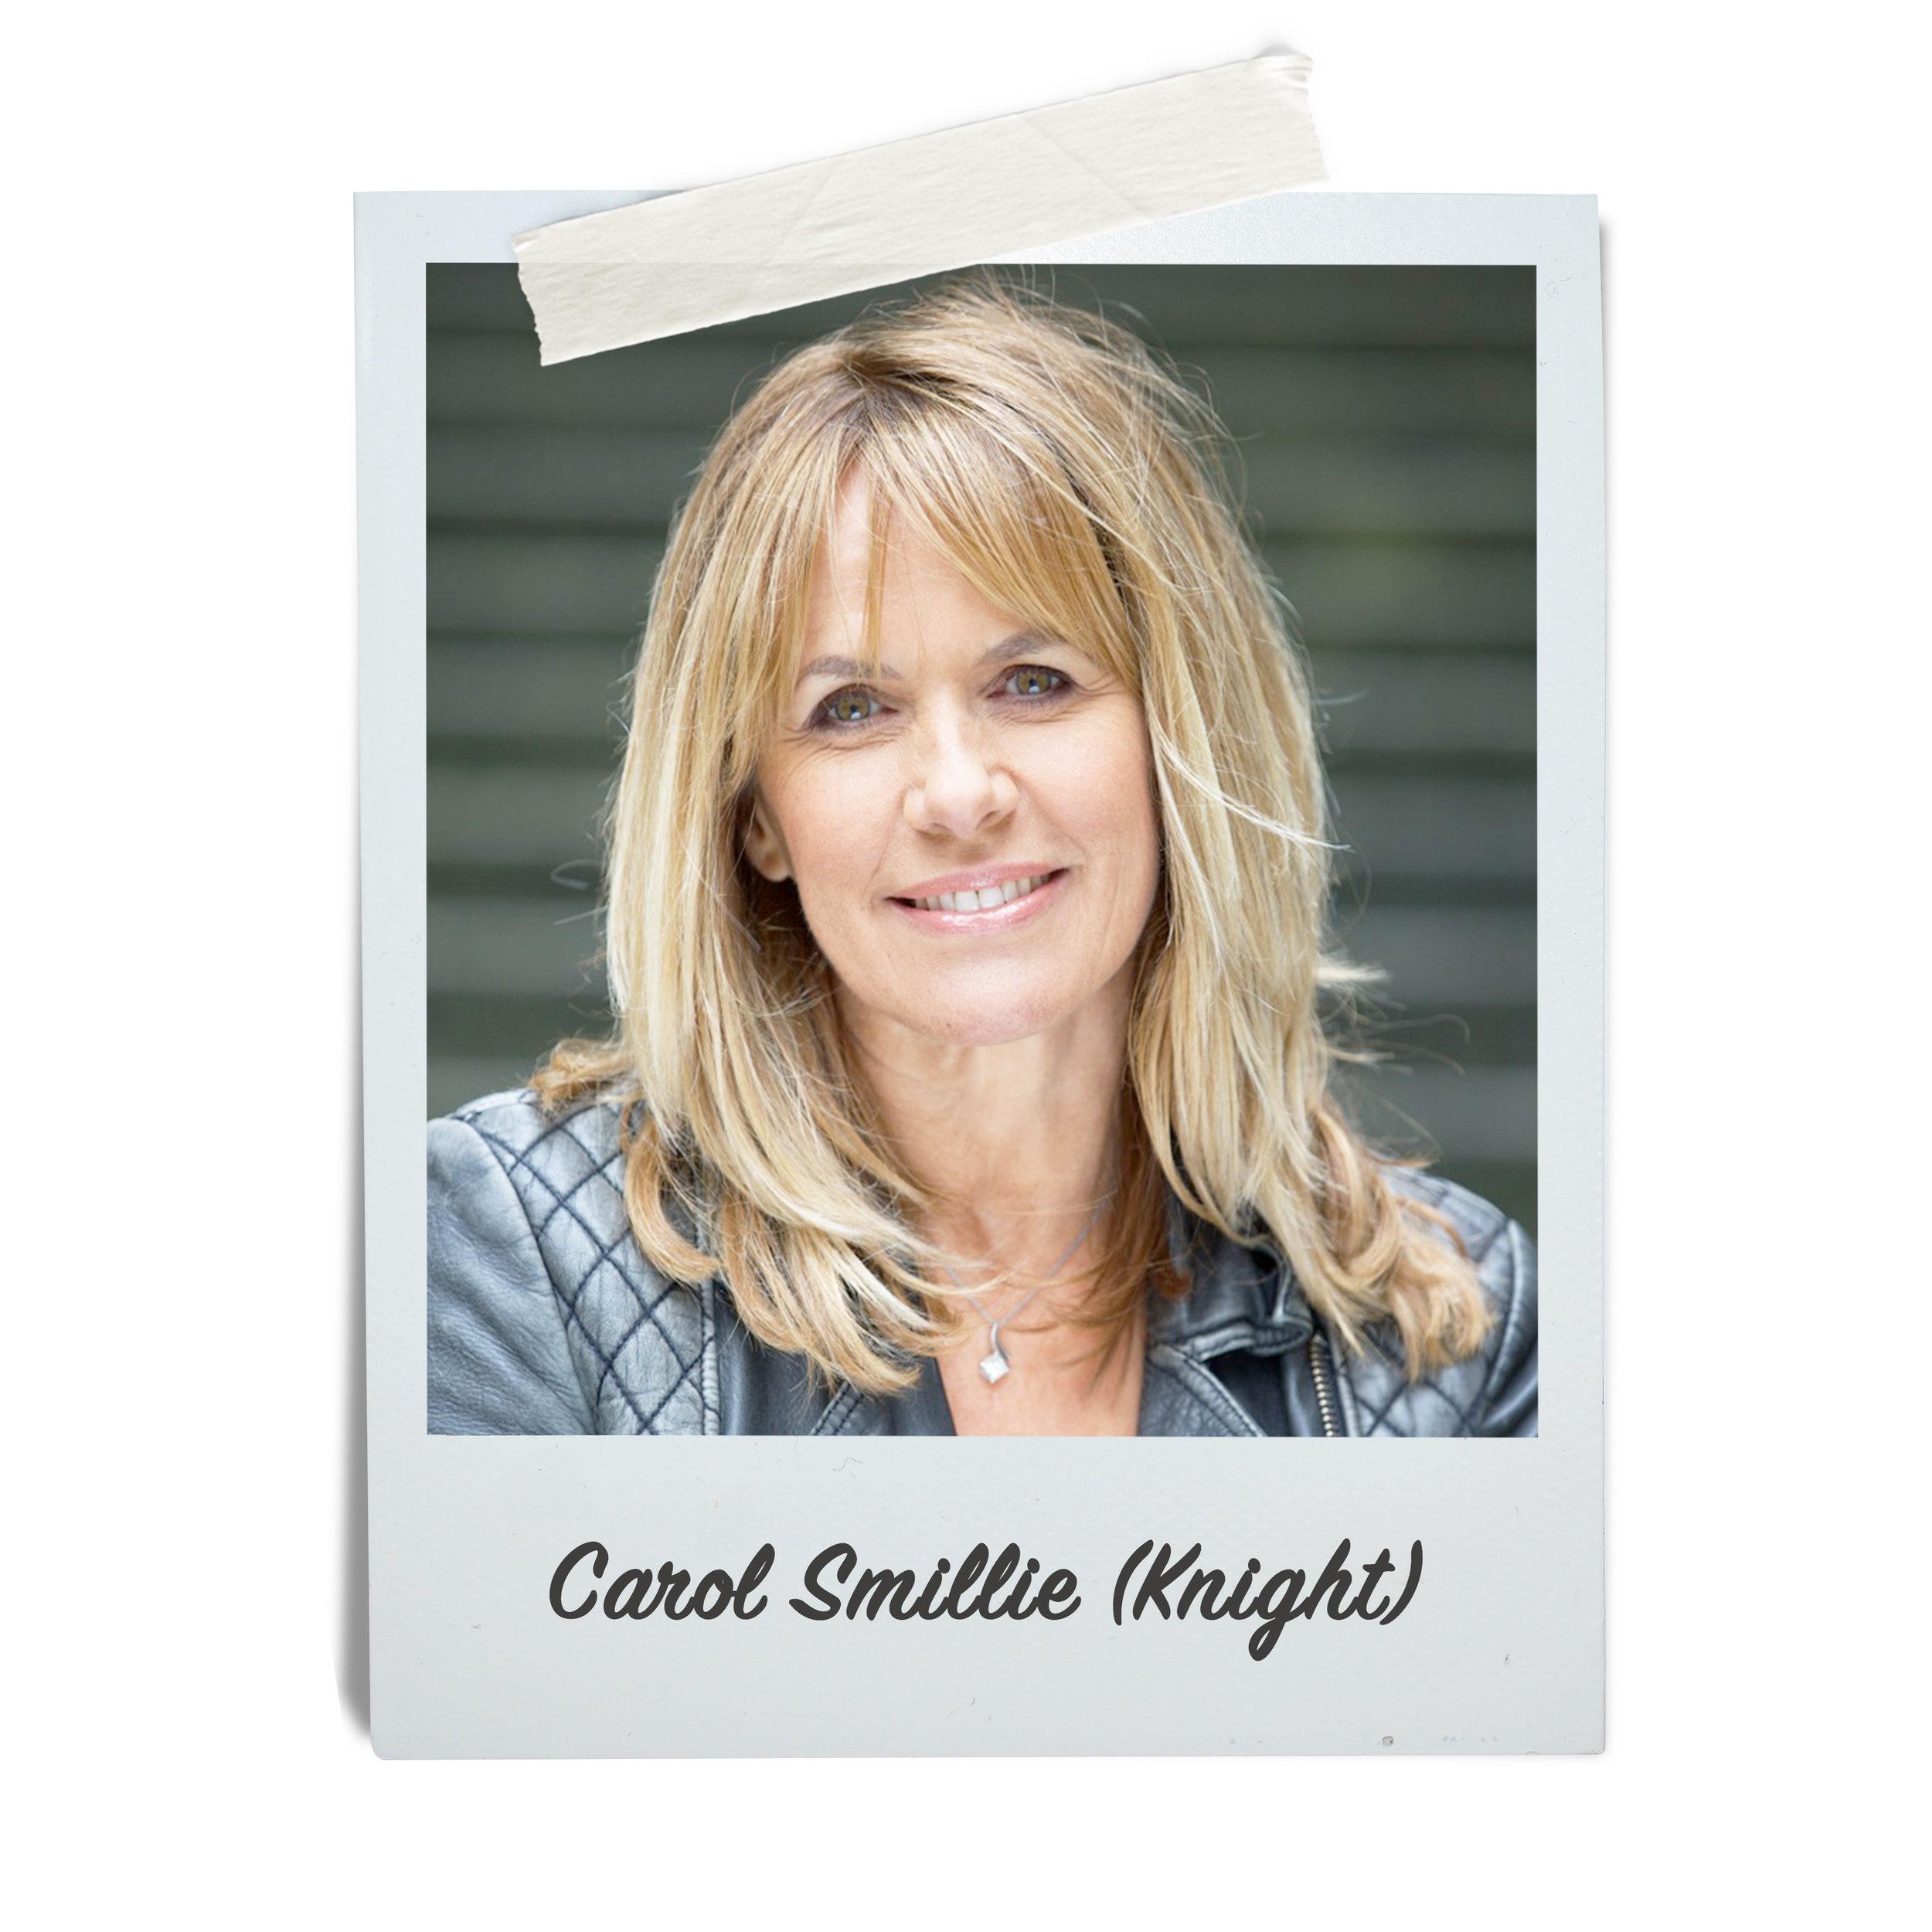 Carol Smillie (Knight)